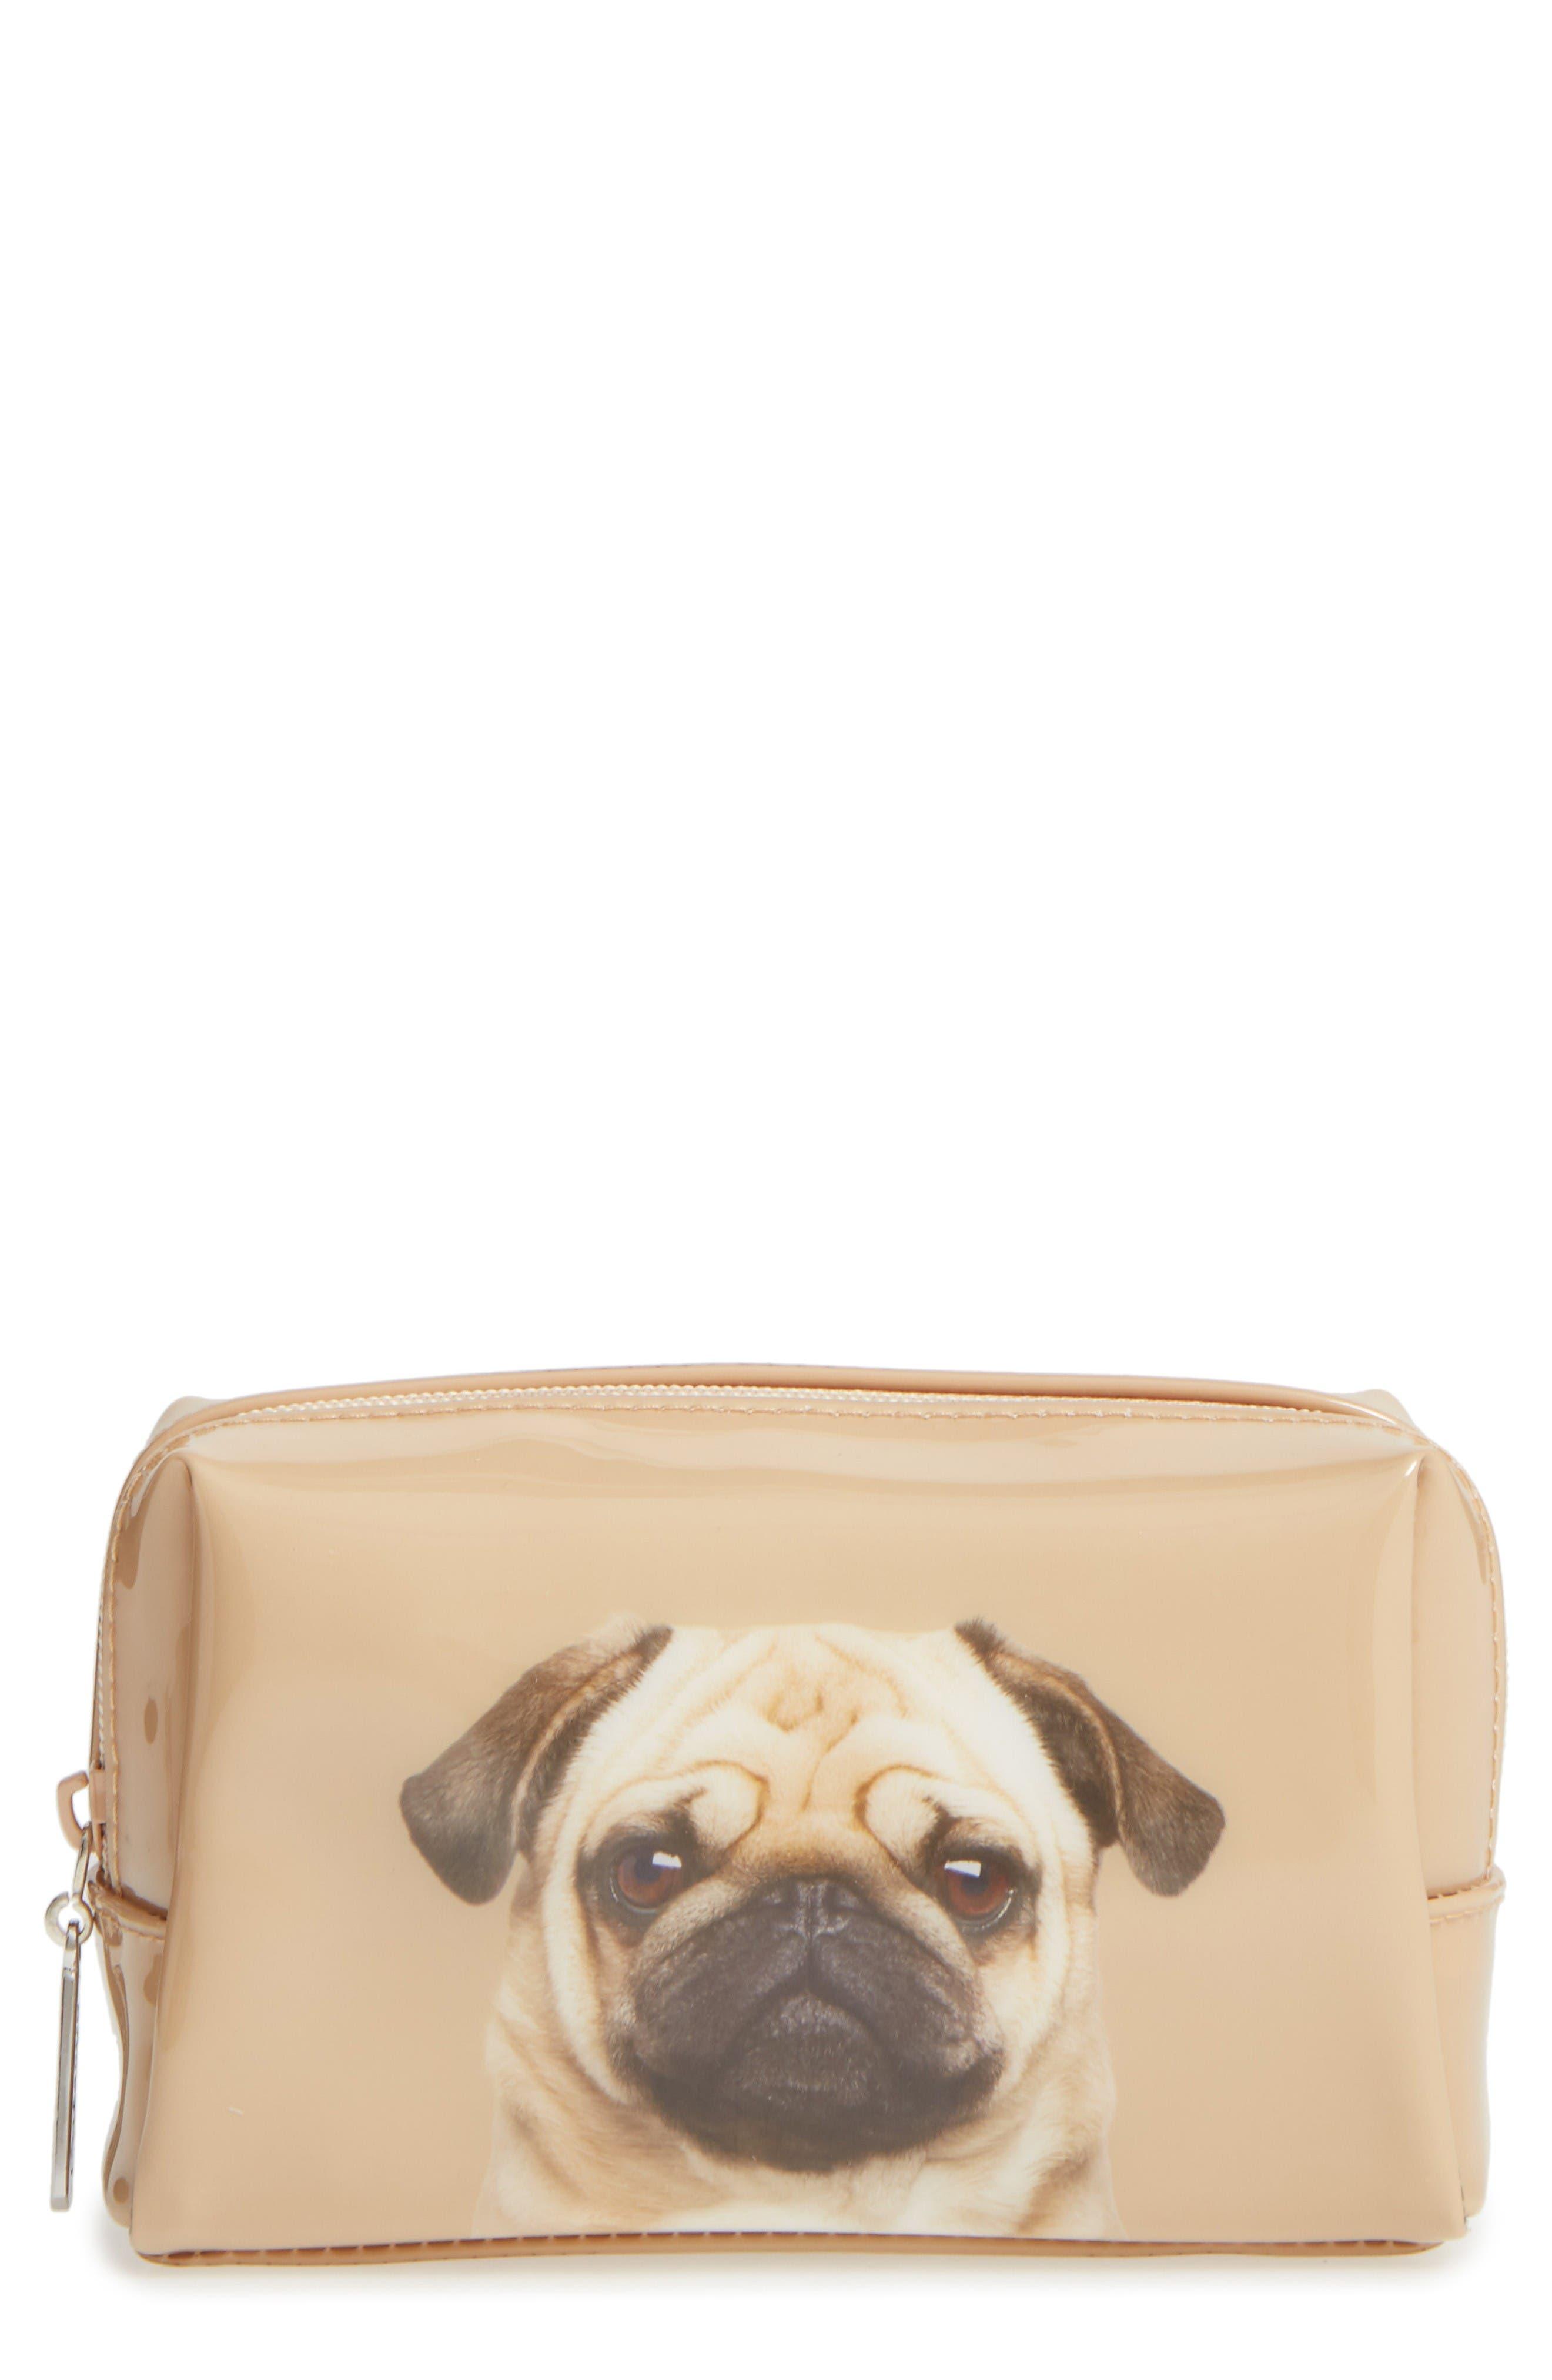 Catseye London Caramel Pug Cosmetics Case